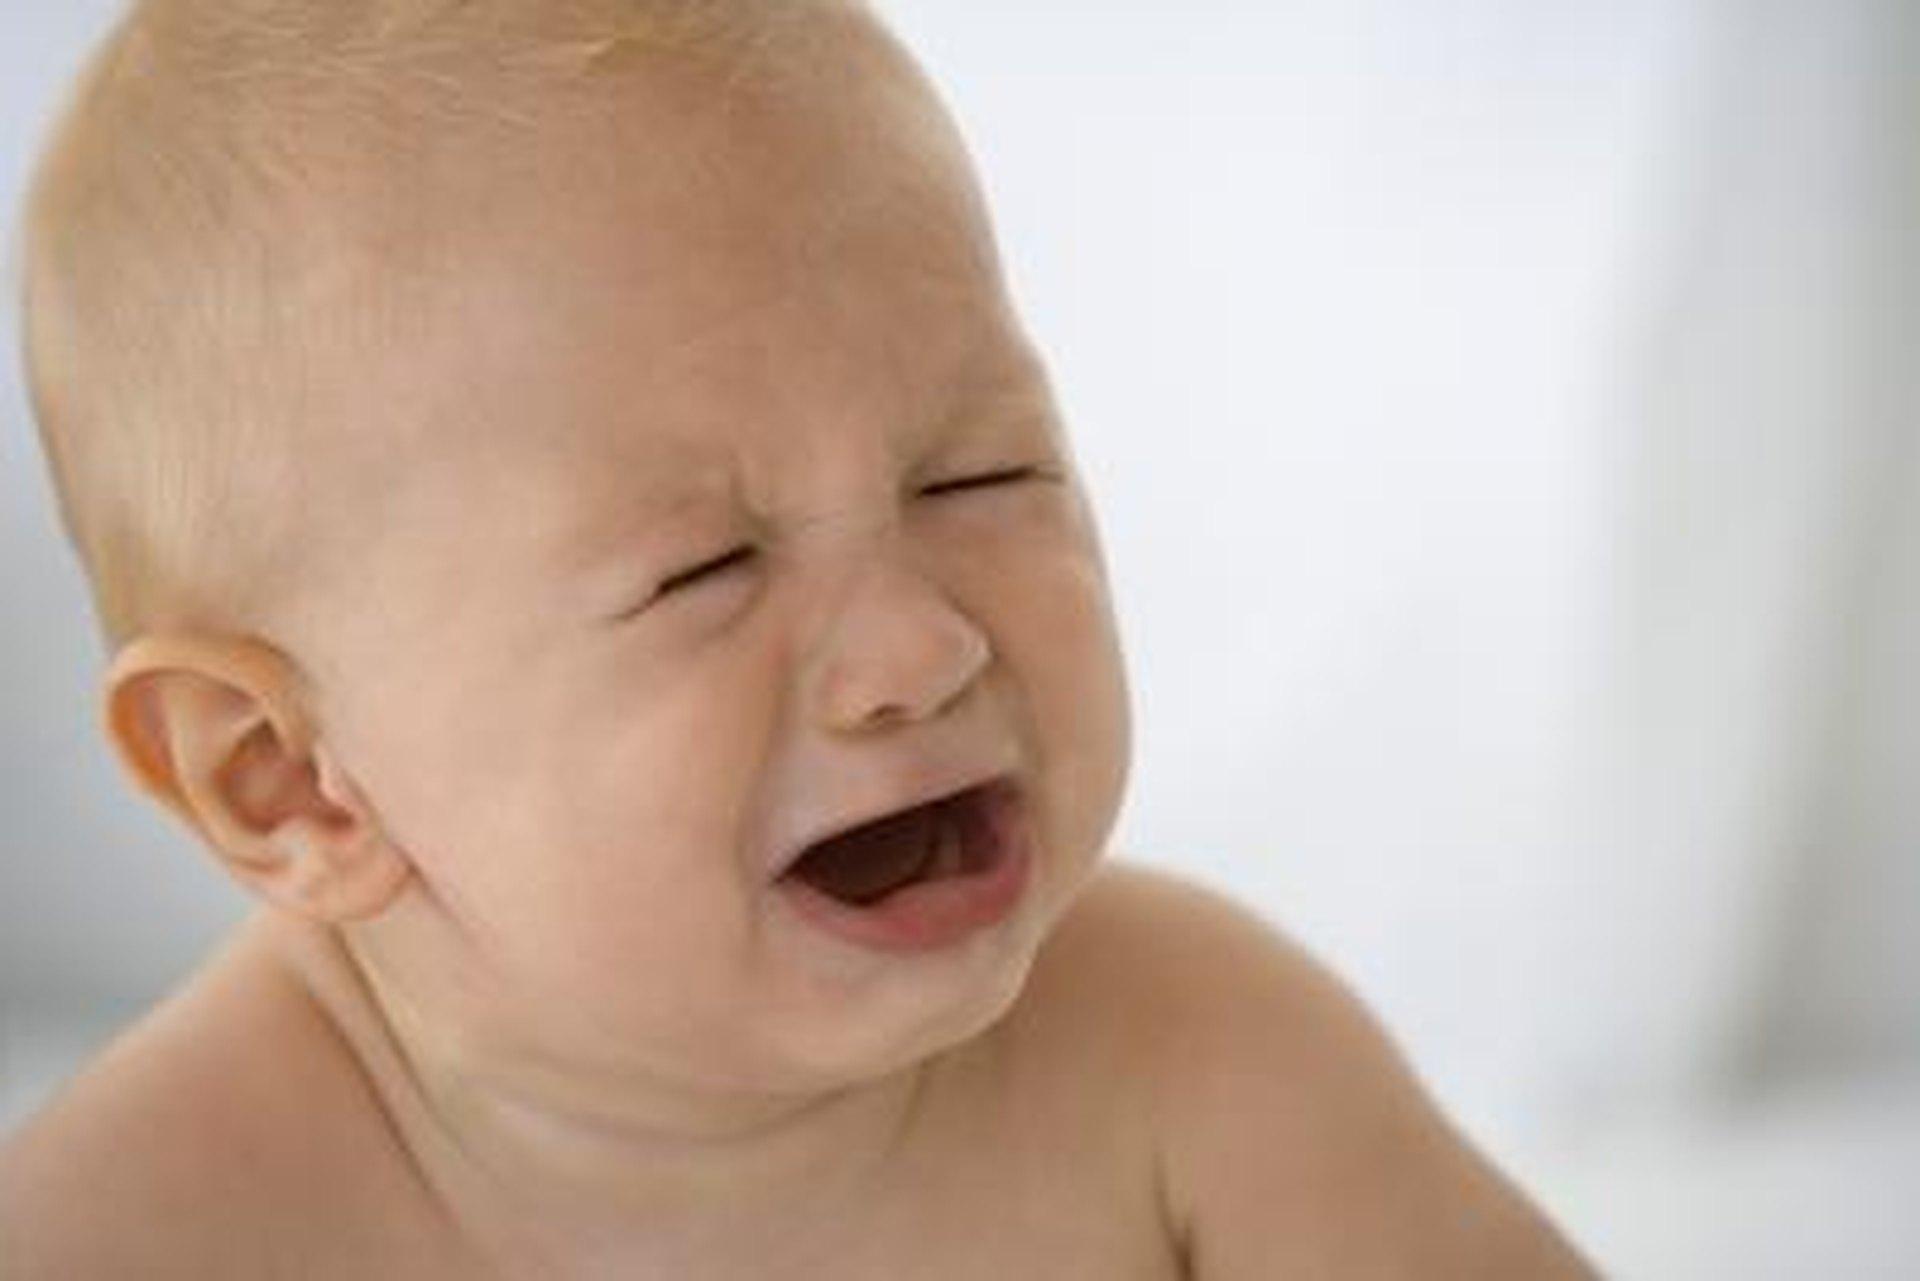 How to Calm a Baby\'s Tummy Ache | LIVESTRONG.COM